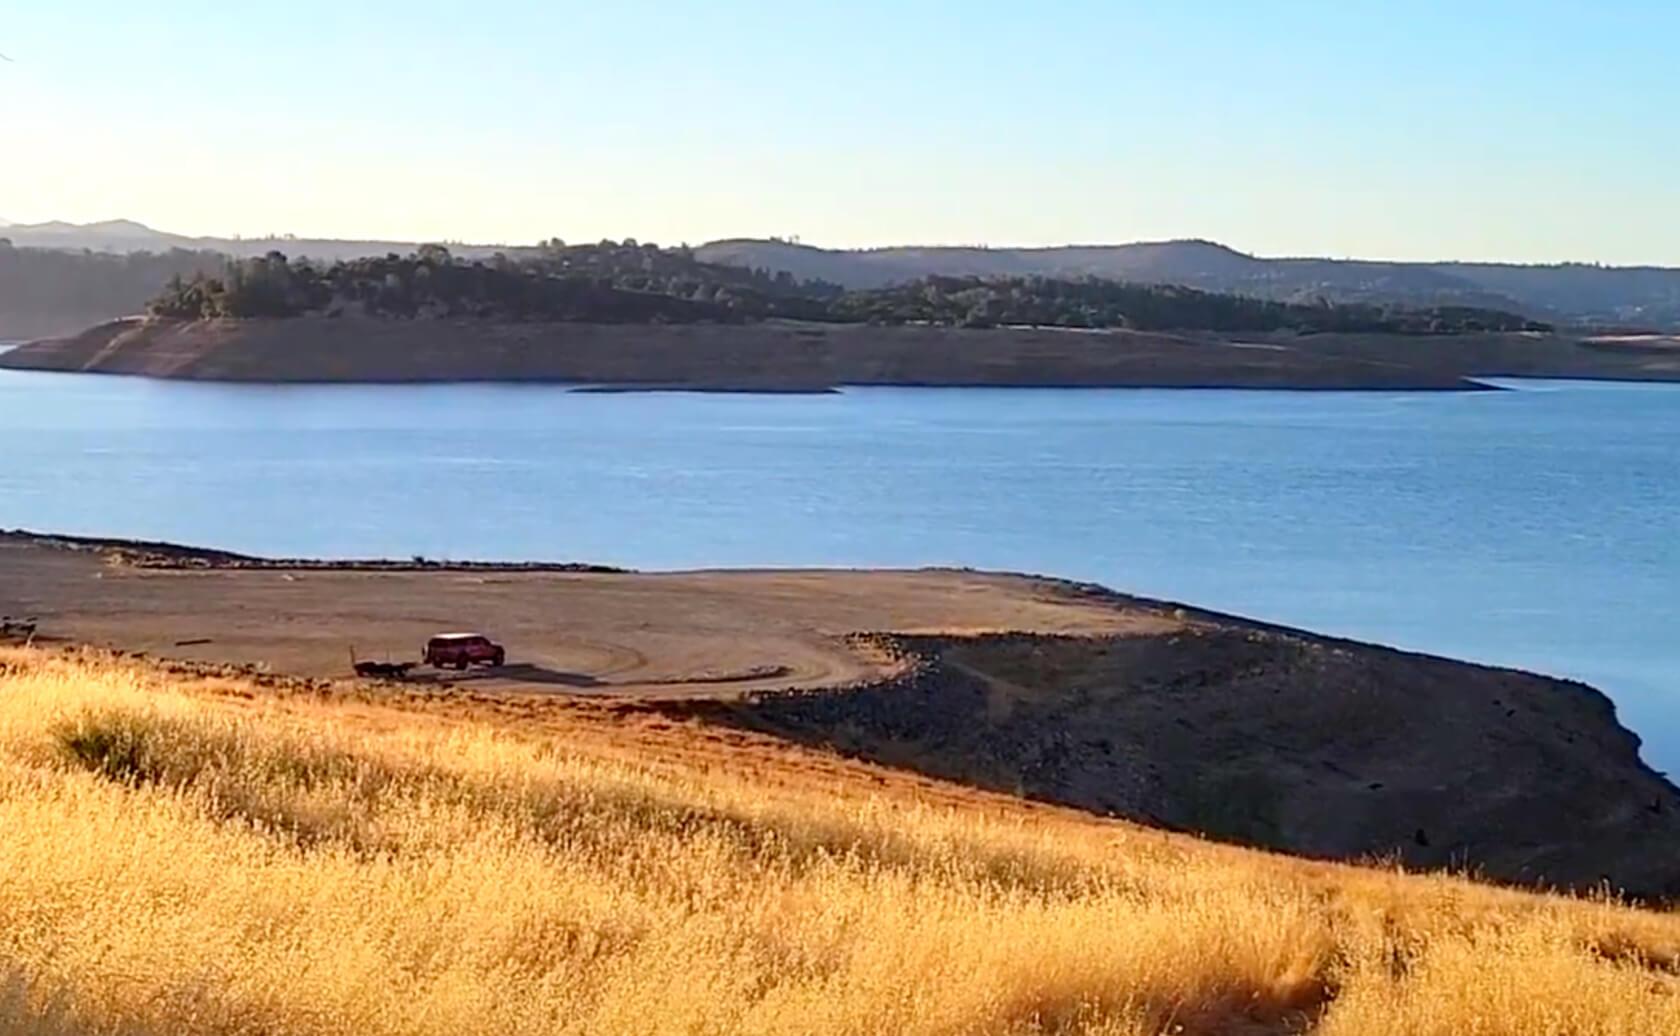 New-Melones-Lake-Fishing-Guide-Report-California-05